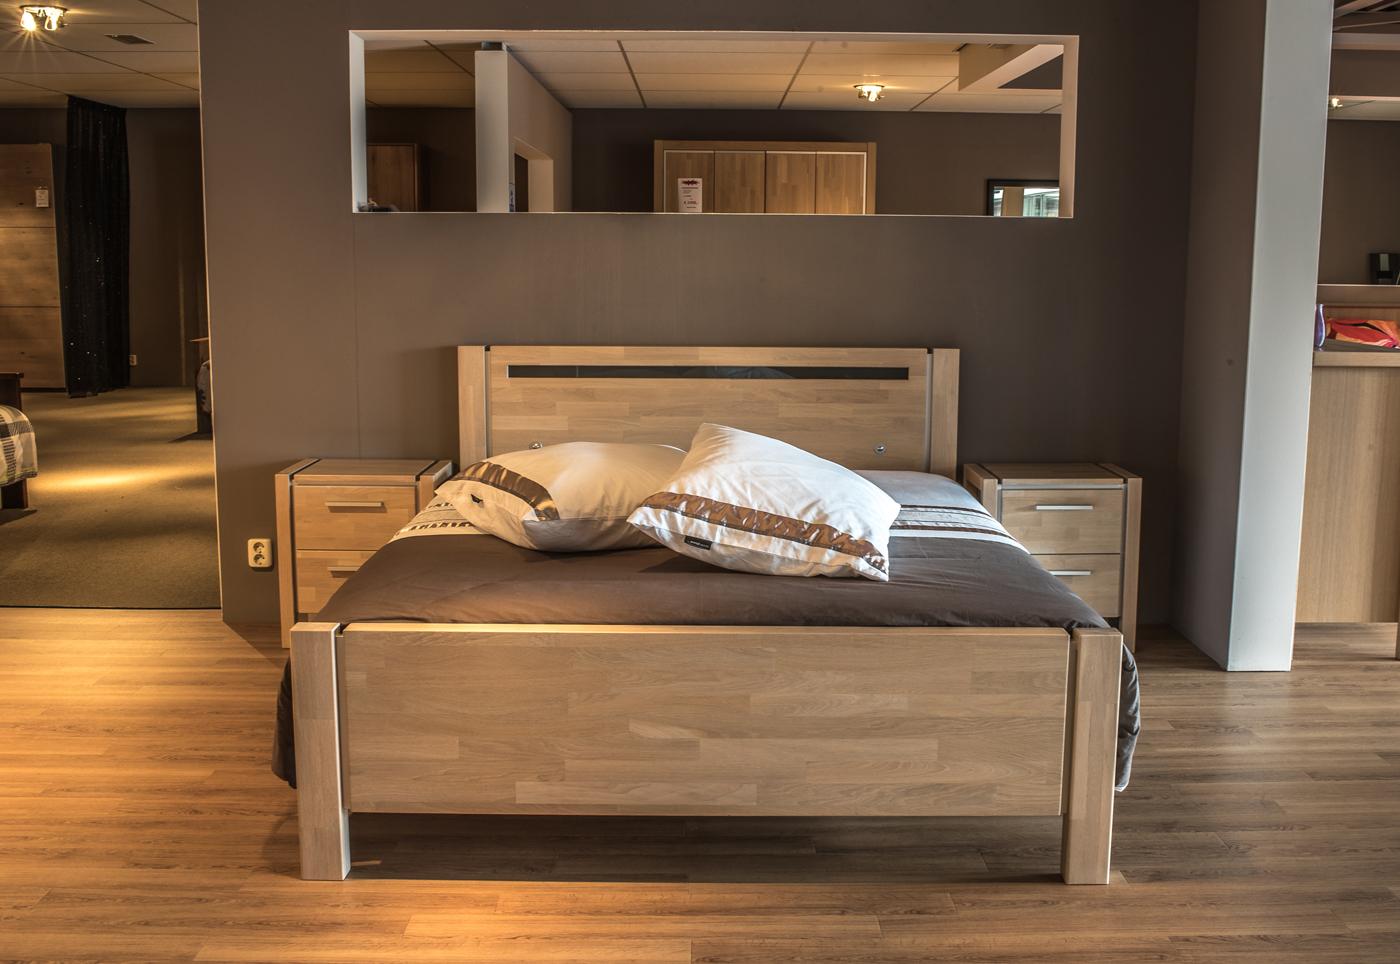 Awesome Slaapkamer Modellen Pictures - Huis & Interieur Ideeën ...